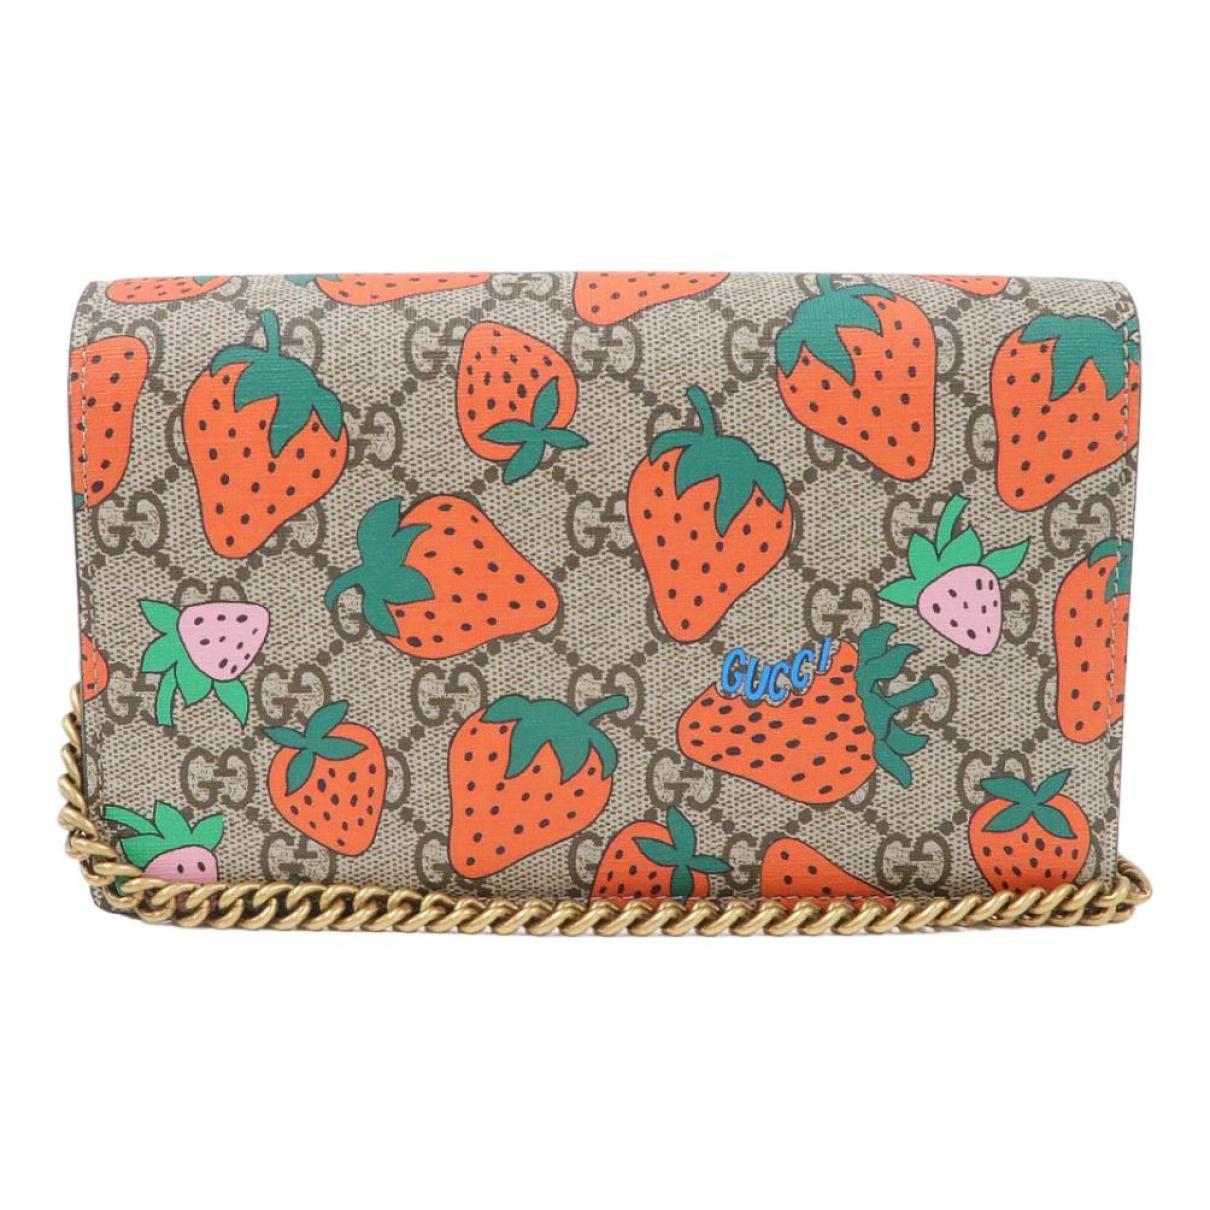 Gucci N Multicolour Cloth Clutch bag for Women N